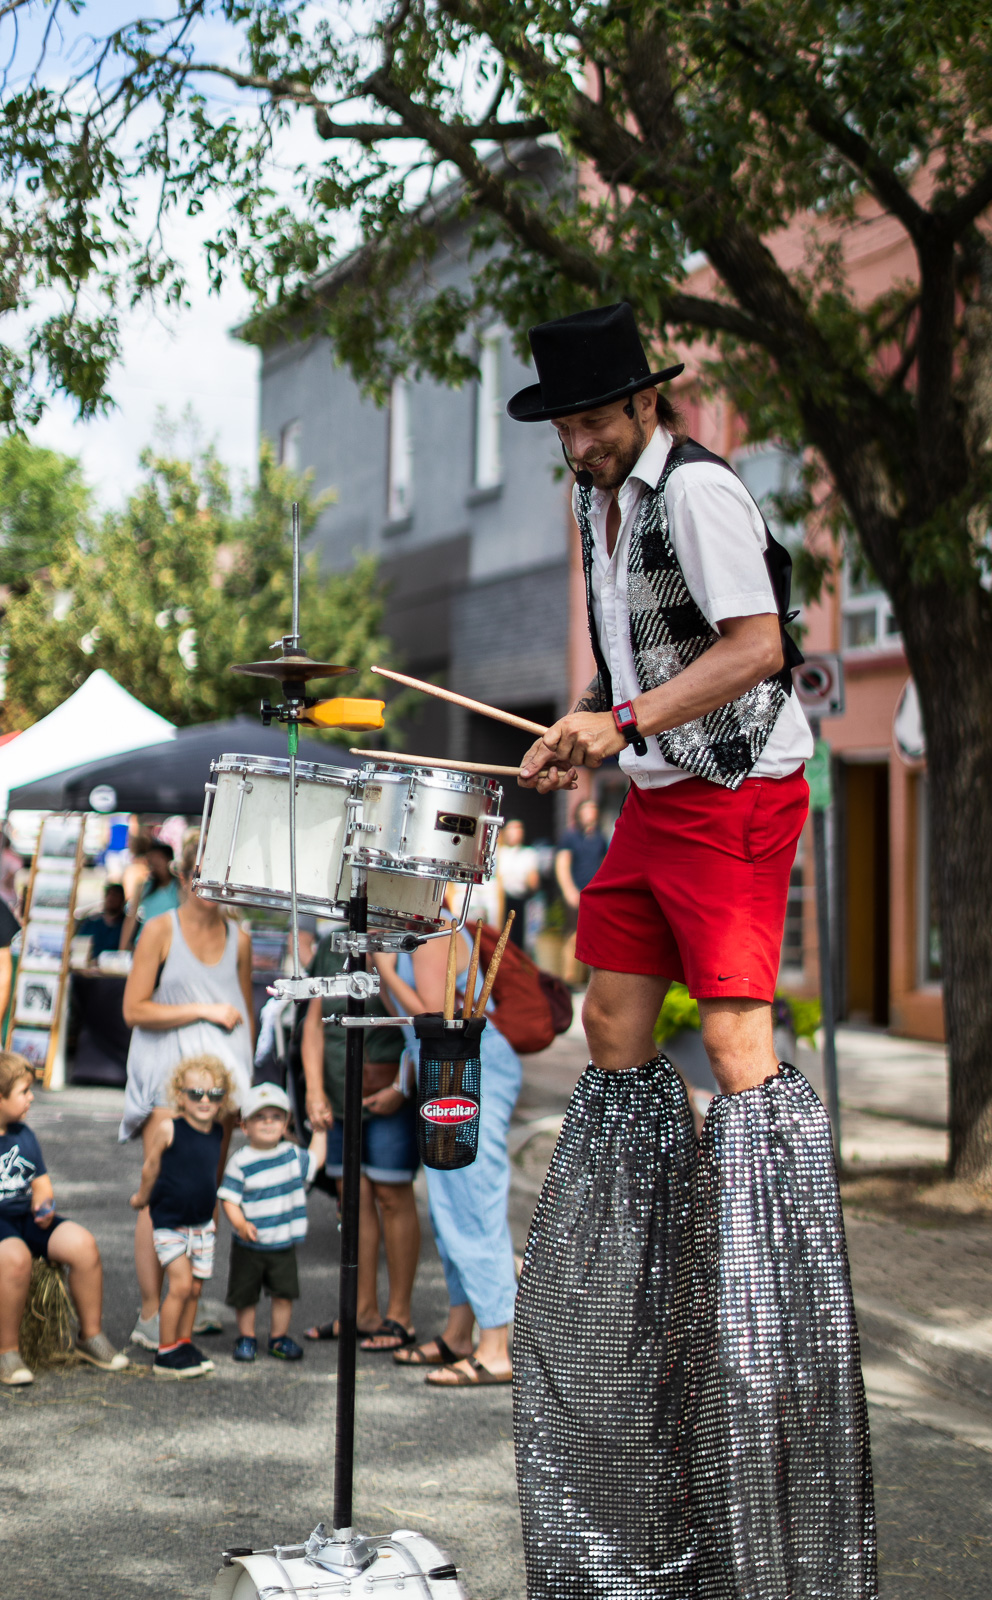 7th-annual-buskers-festival-blog-7.jpg